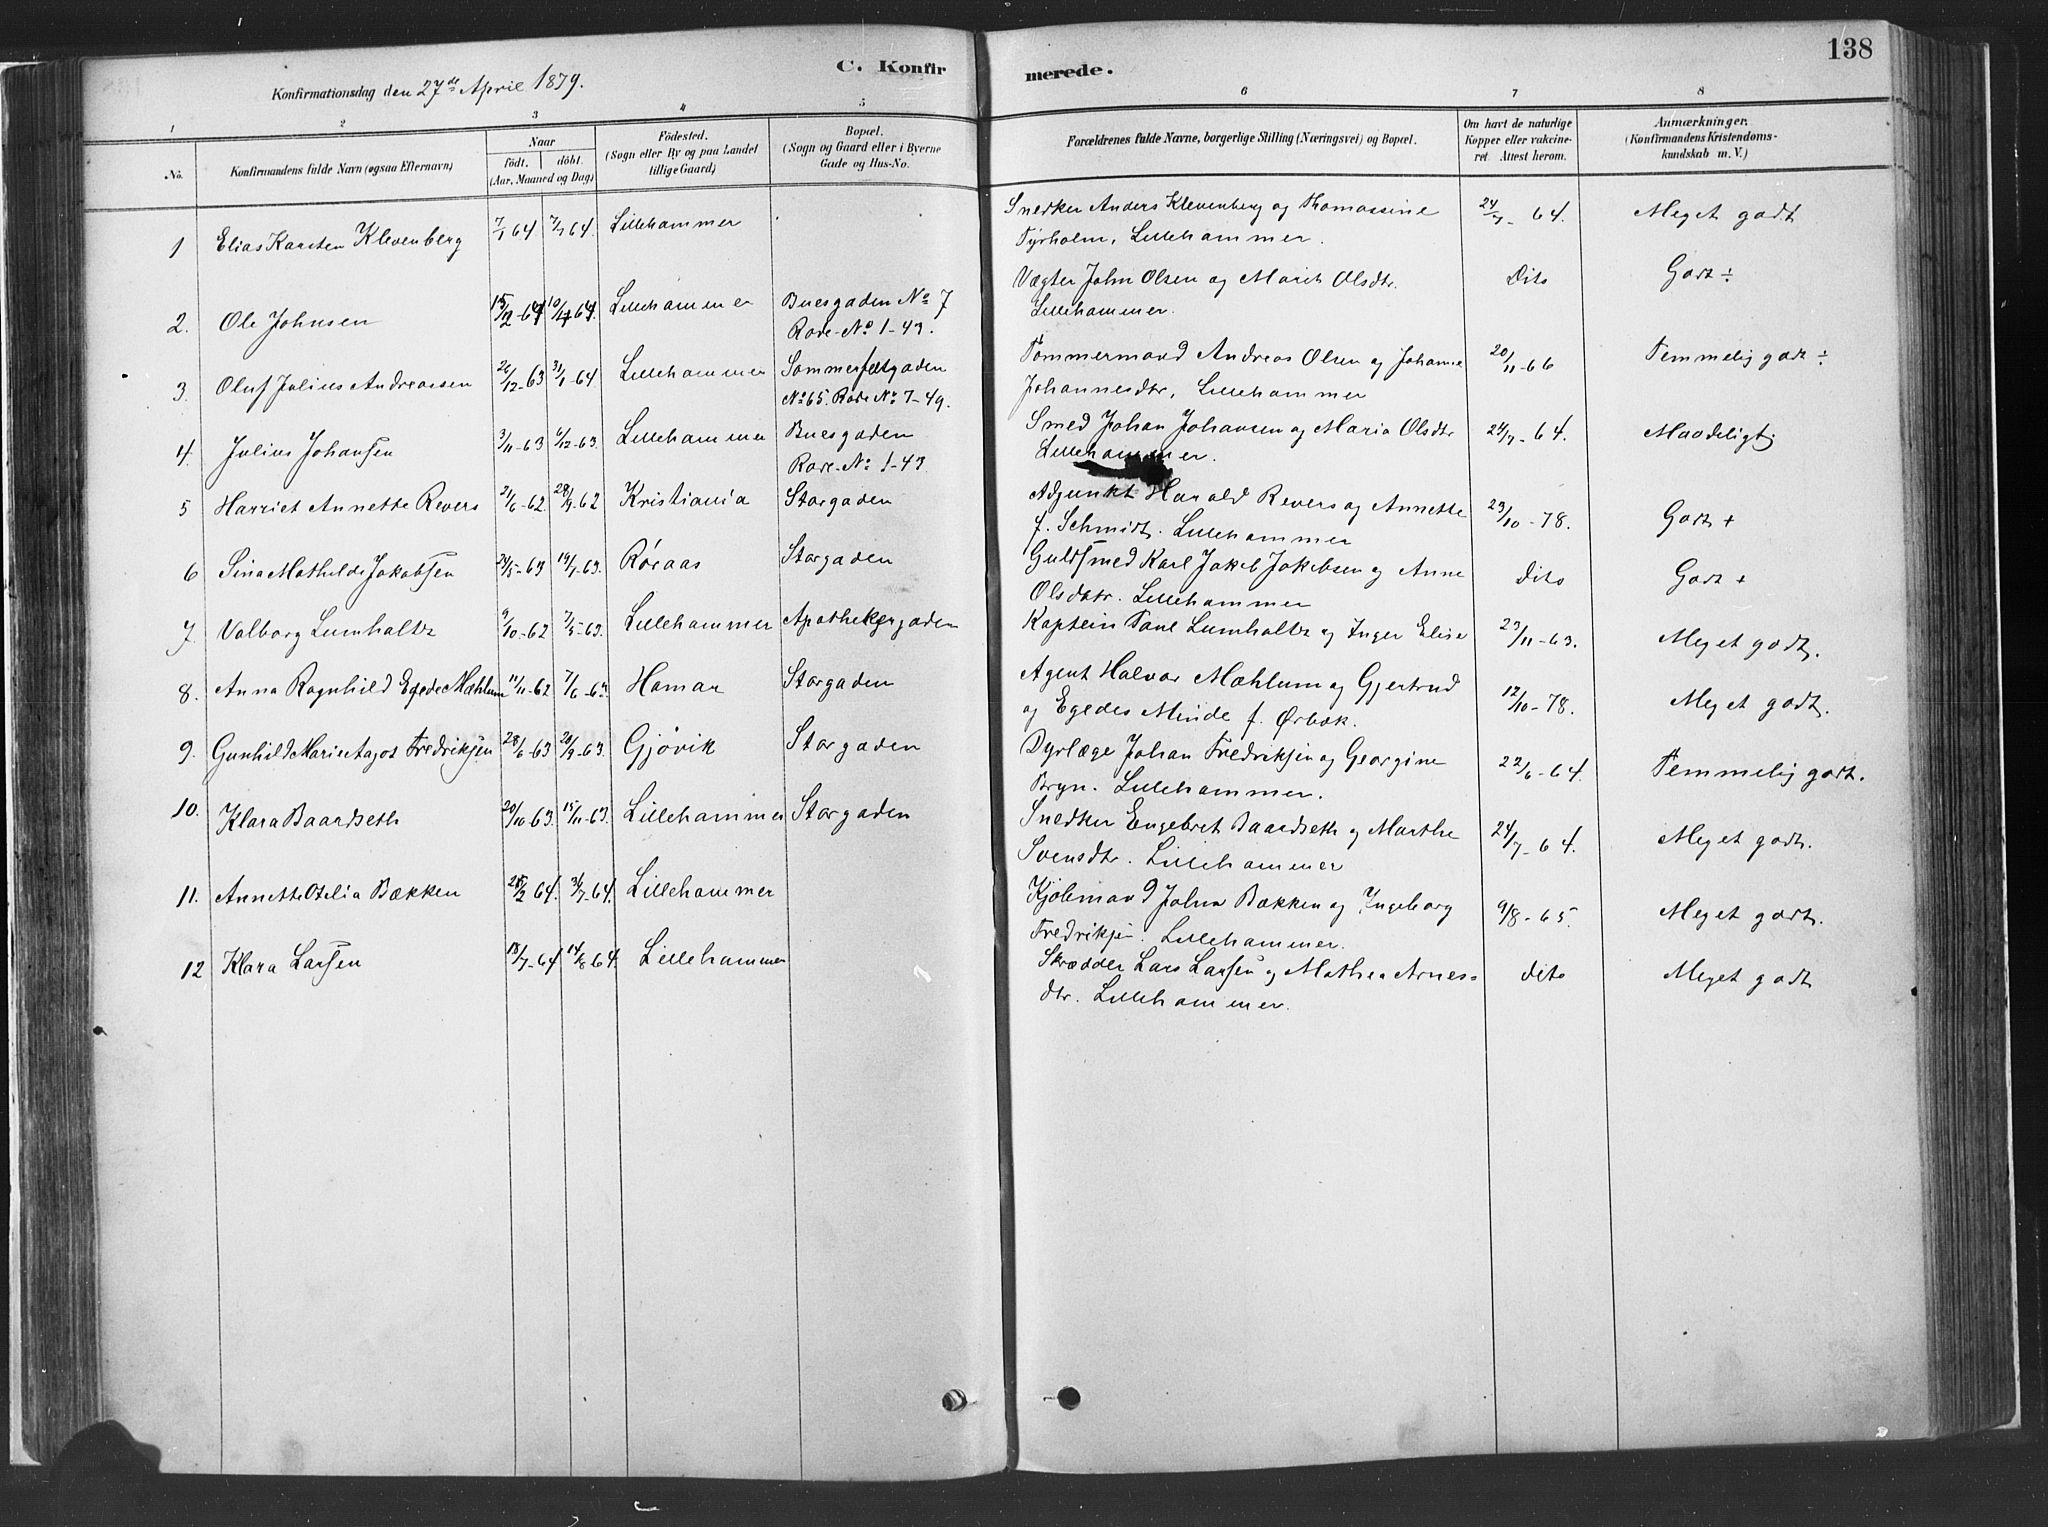 SAH, Fåberg prestekontor, Ministerialbok nr. 10, 1879-1900, s. 138